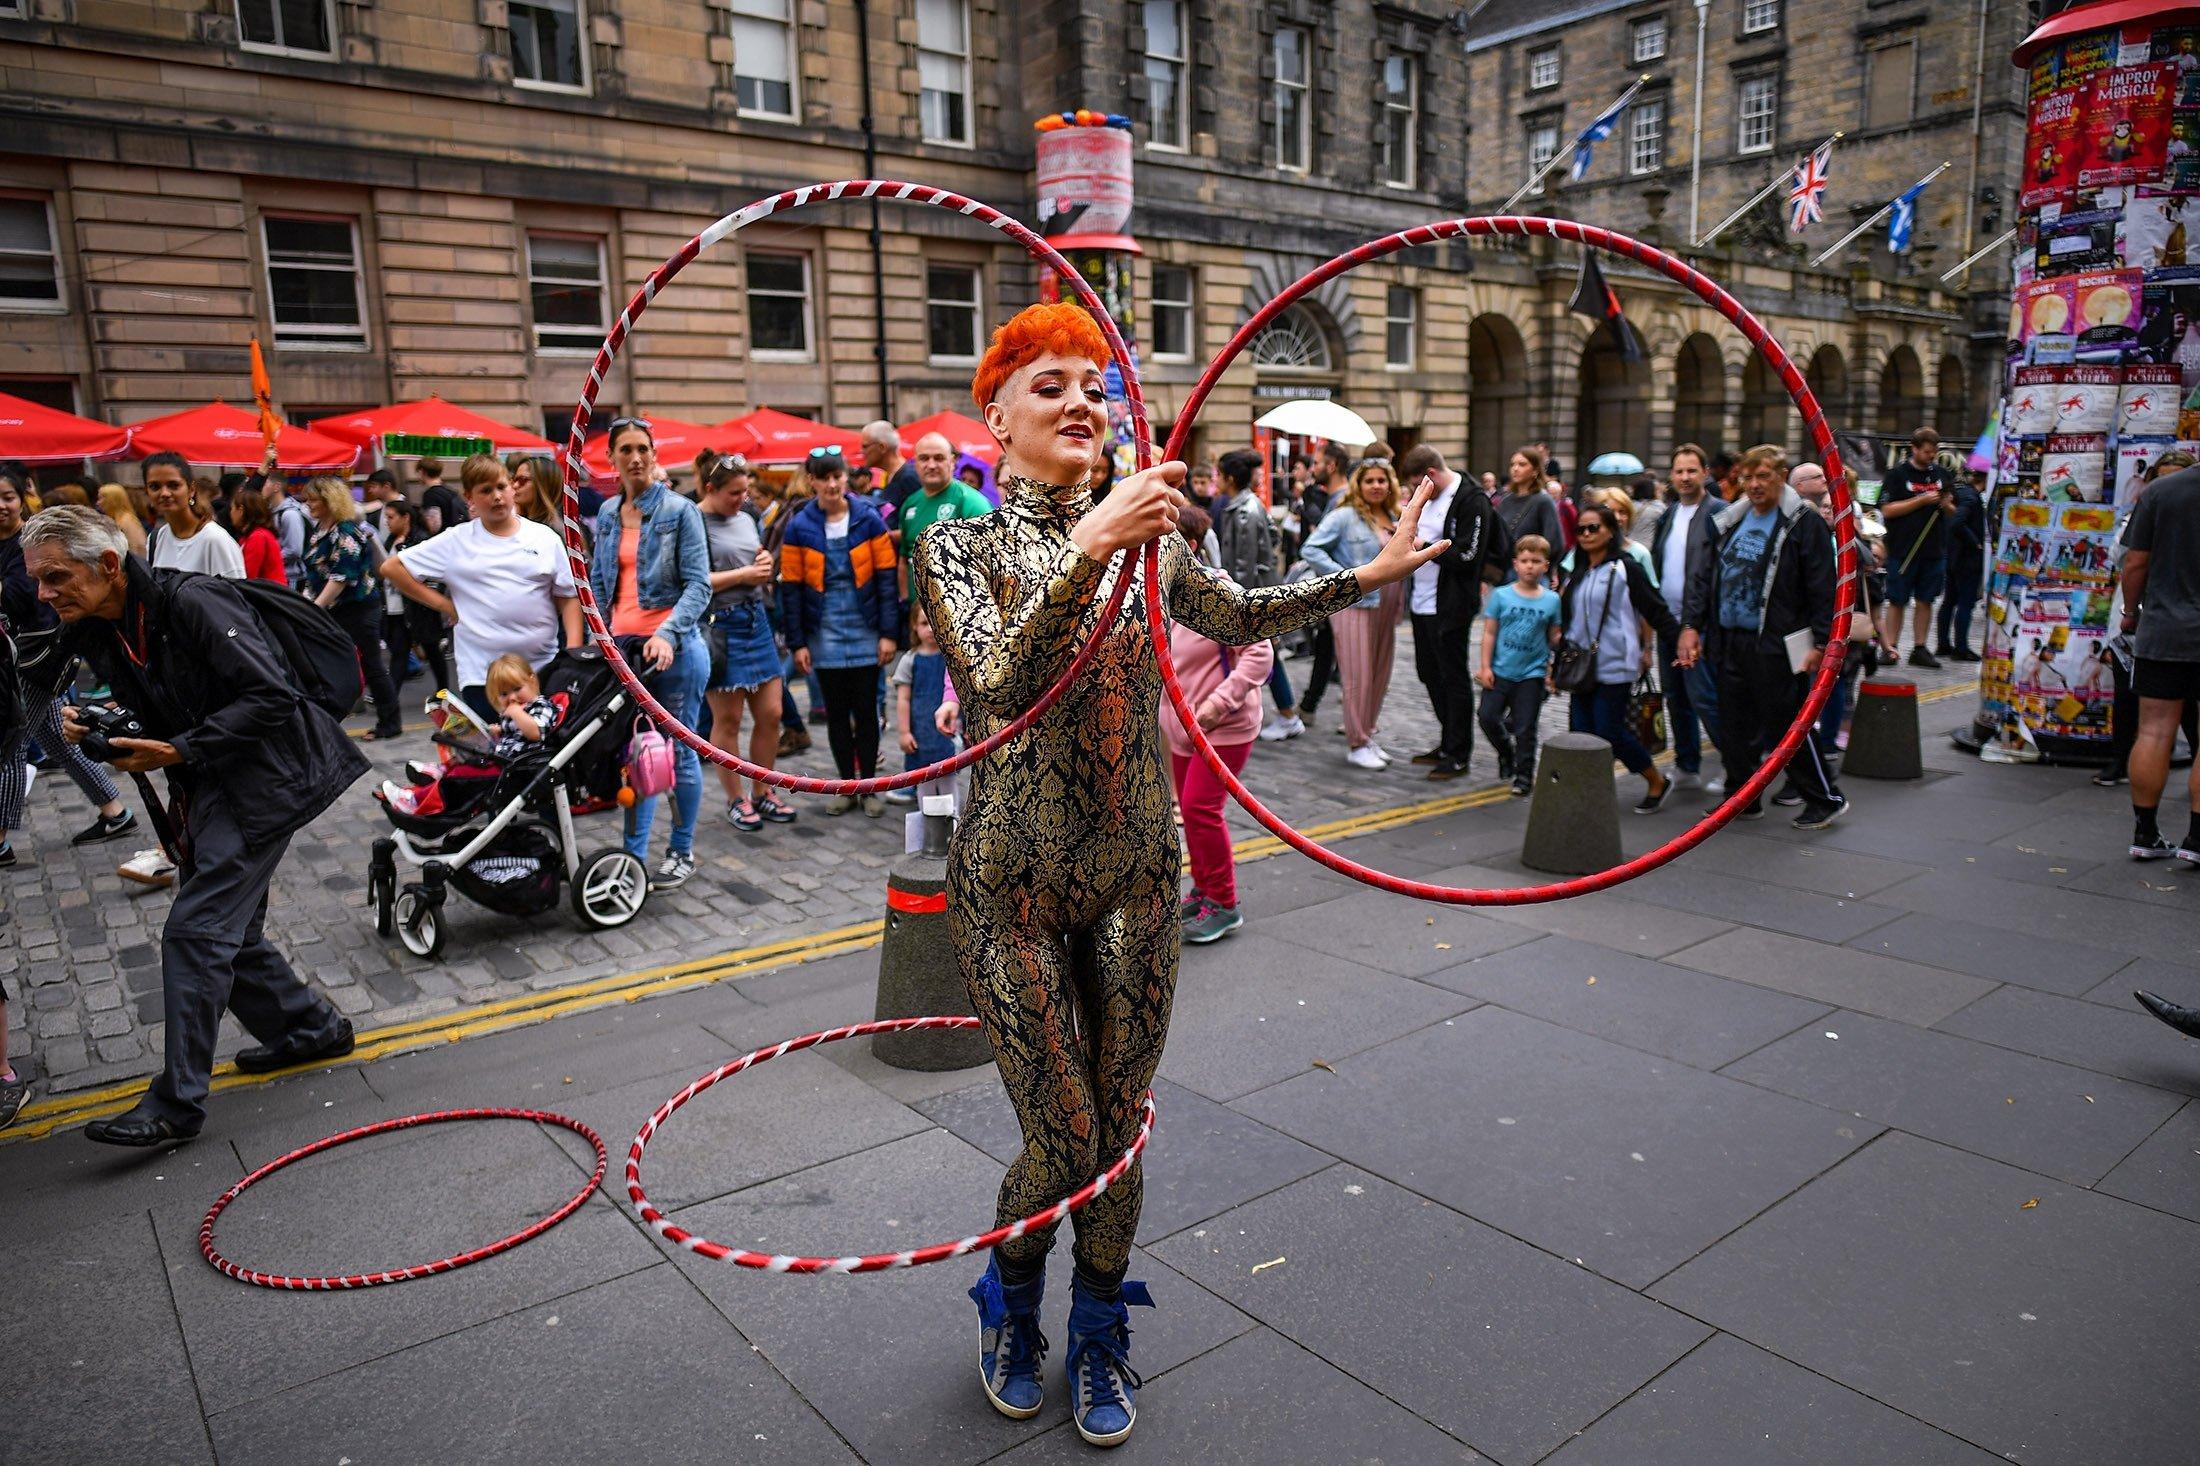 An Edinburgh Festival Fringe entertainer performs on the Royal Mile on Aug. 6, 2019, in Edinburgh, Scotland, U.K. (Getty Images)